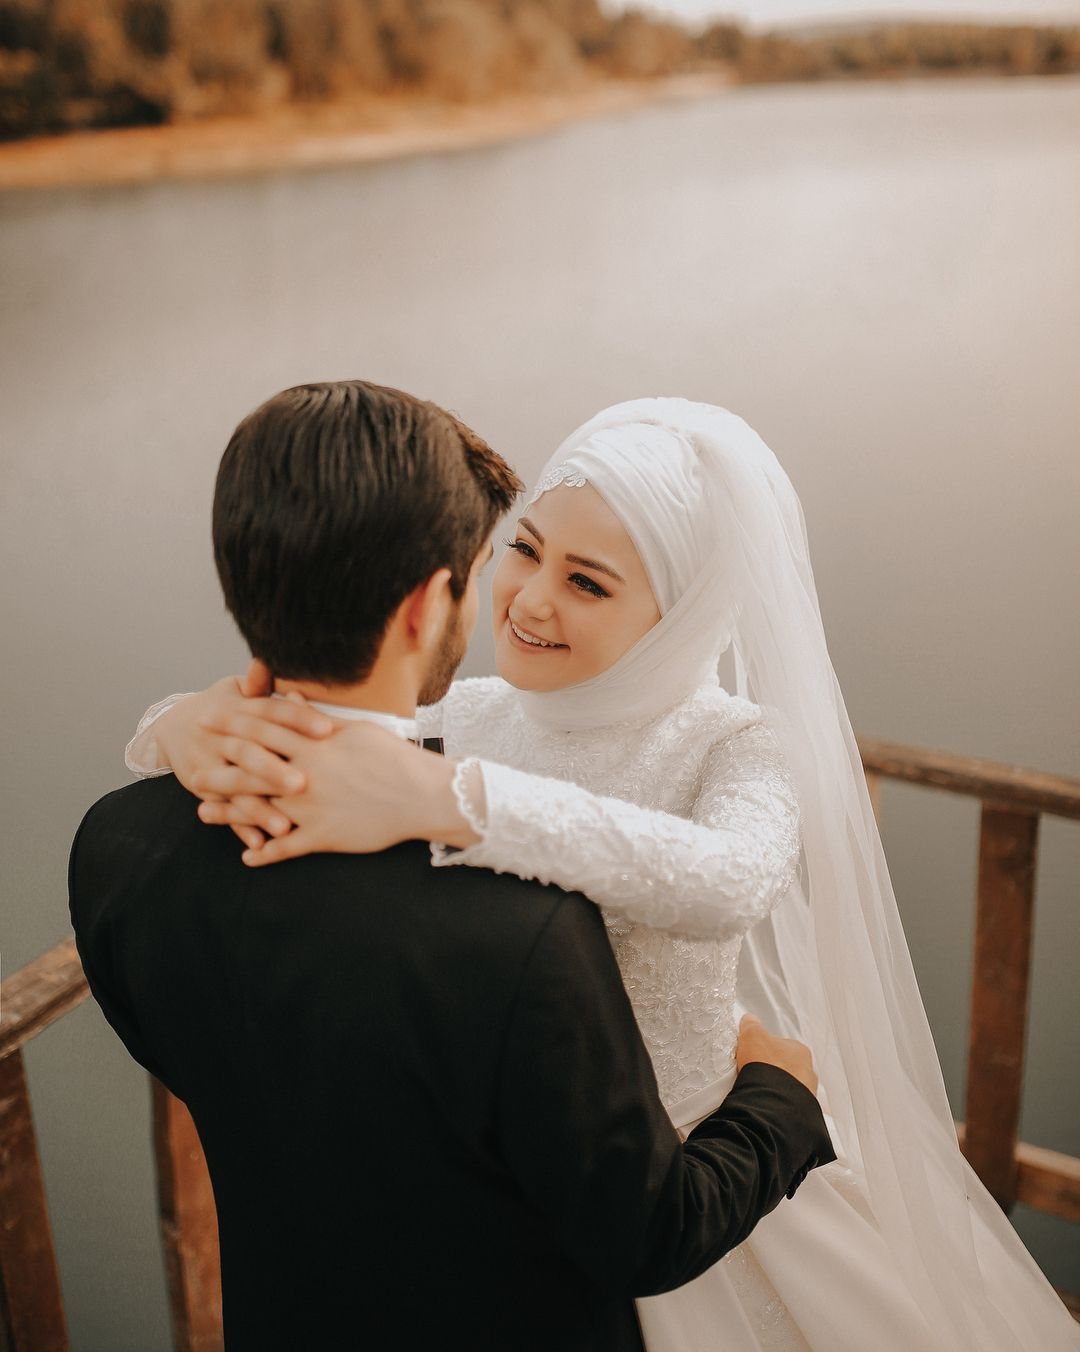 صور زفاف Muslim Wedding Photography Muslim Couples Muslim Couple Photography